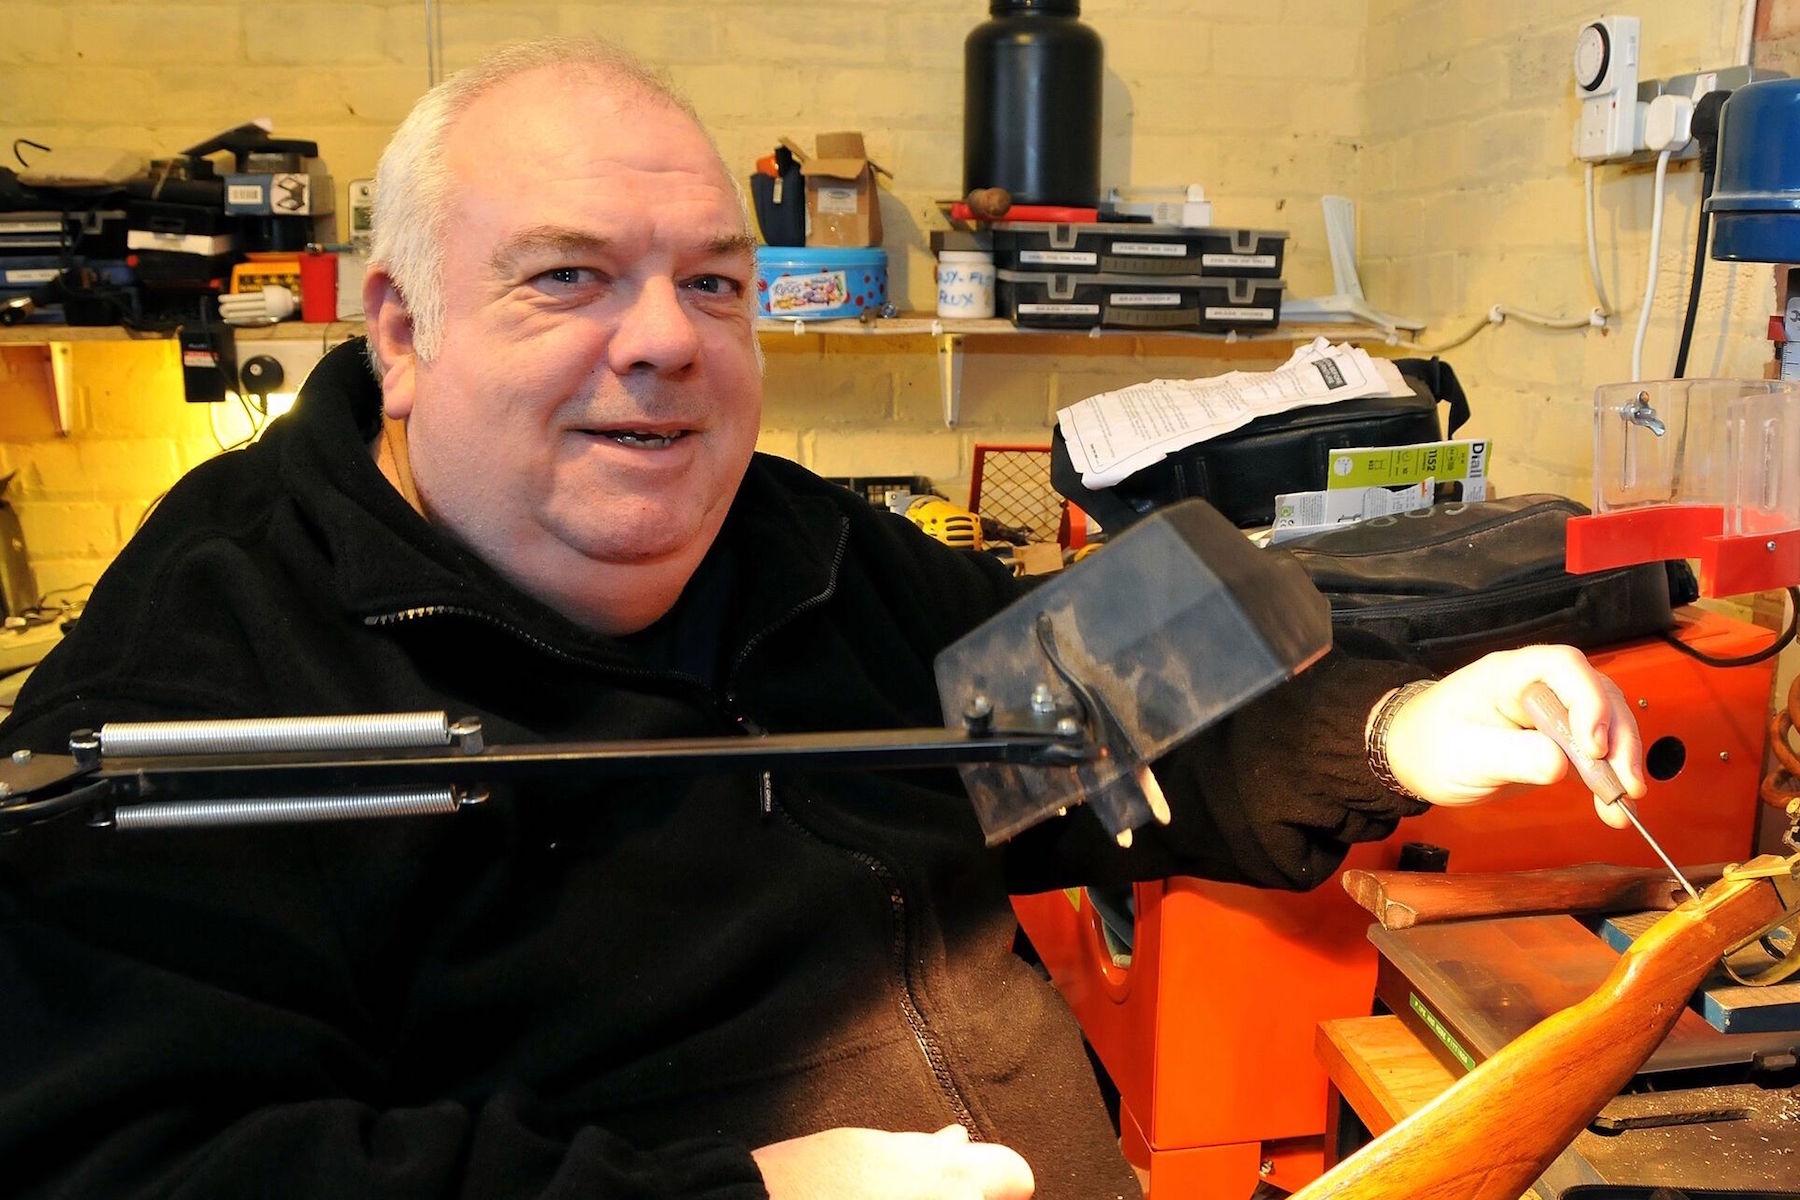 Colin Hammond Advanced Refractive Cataract Surgery